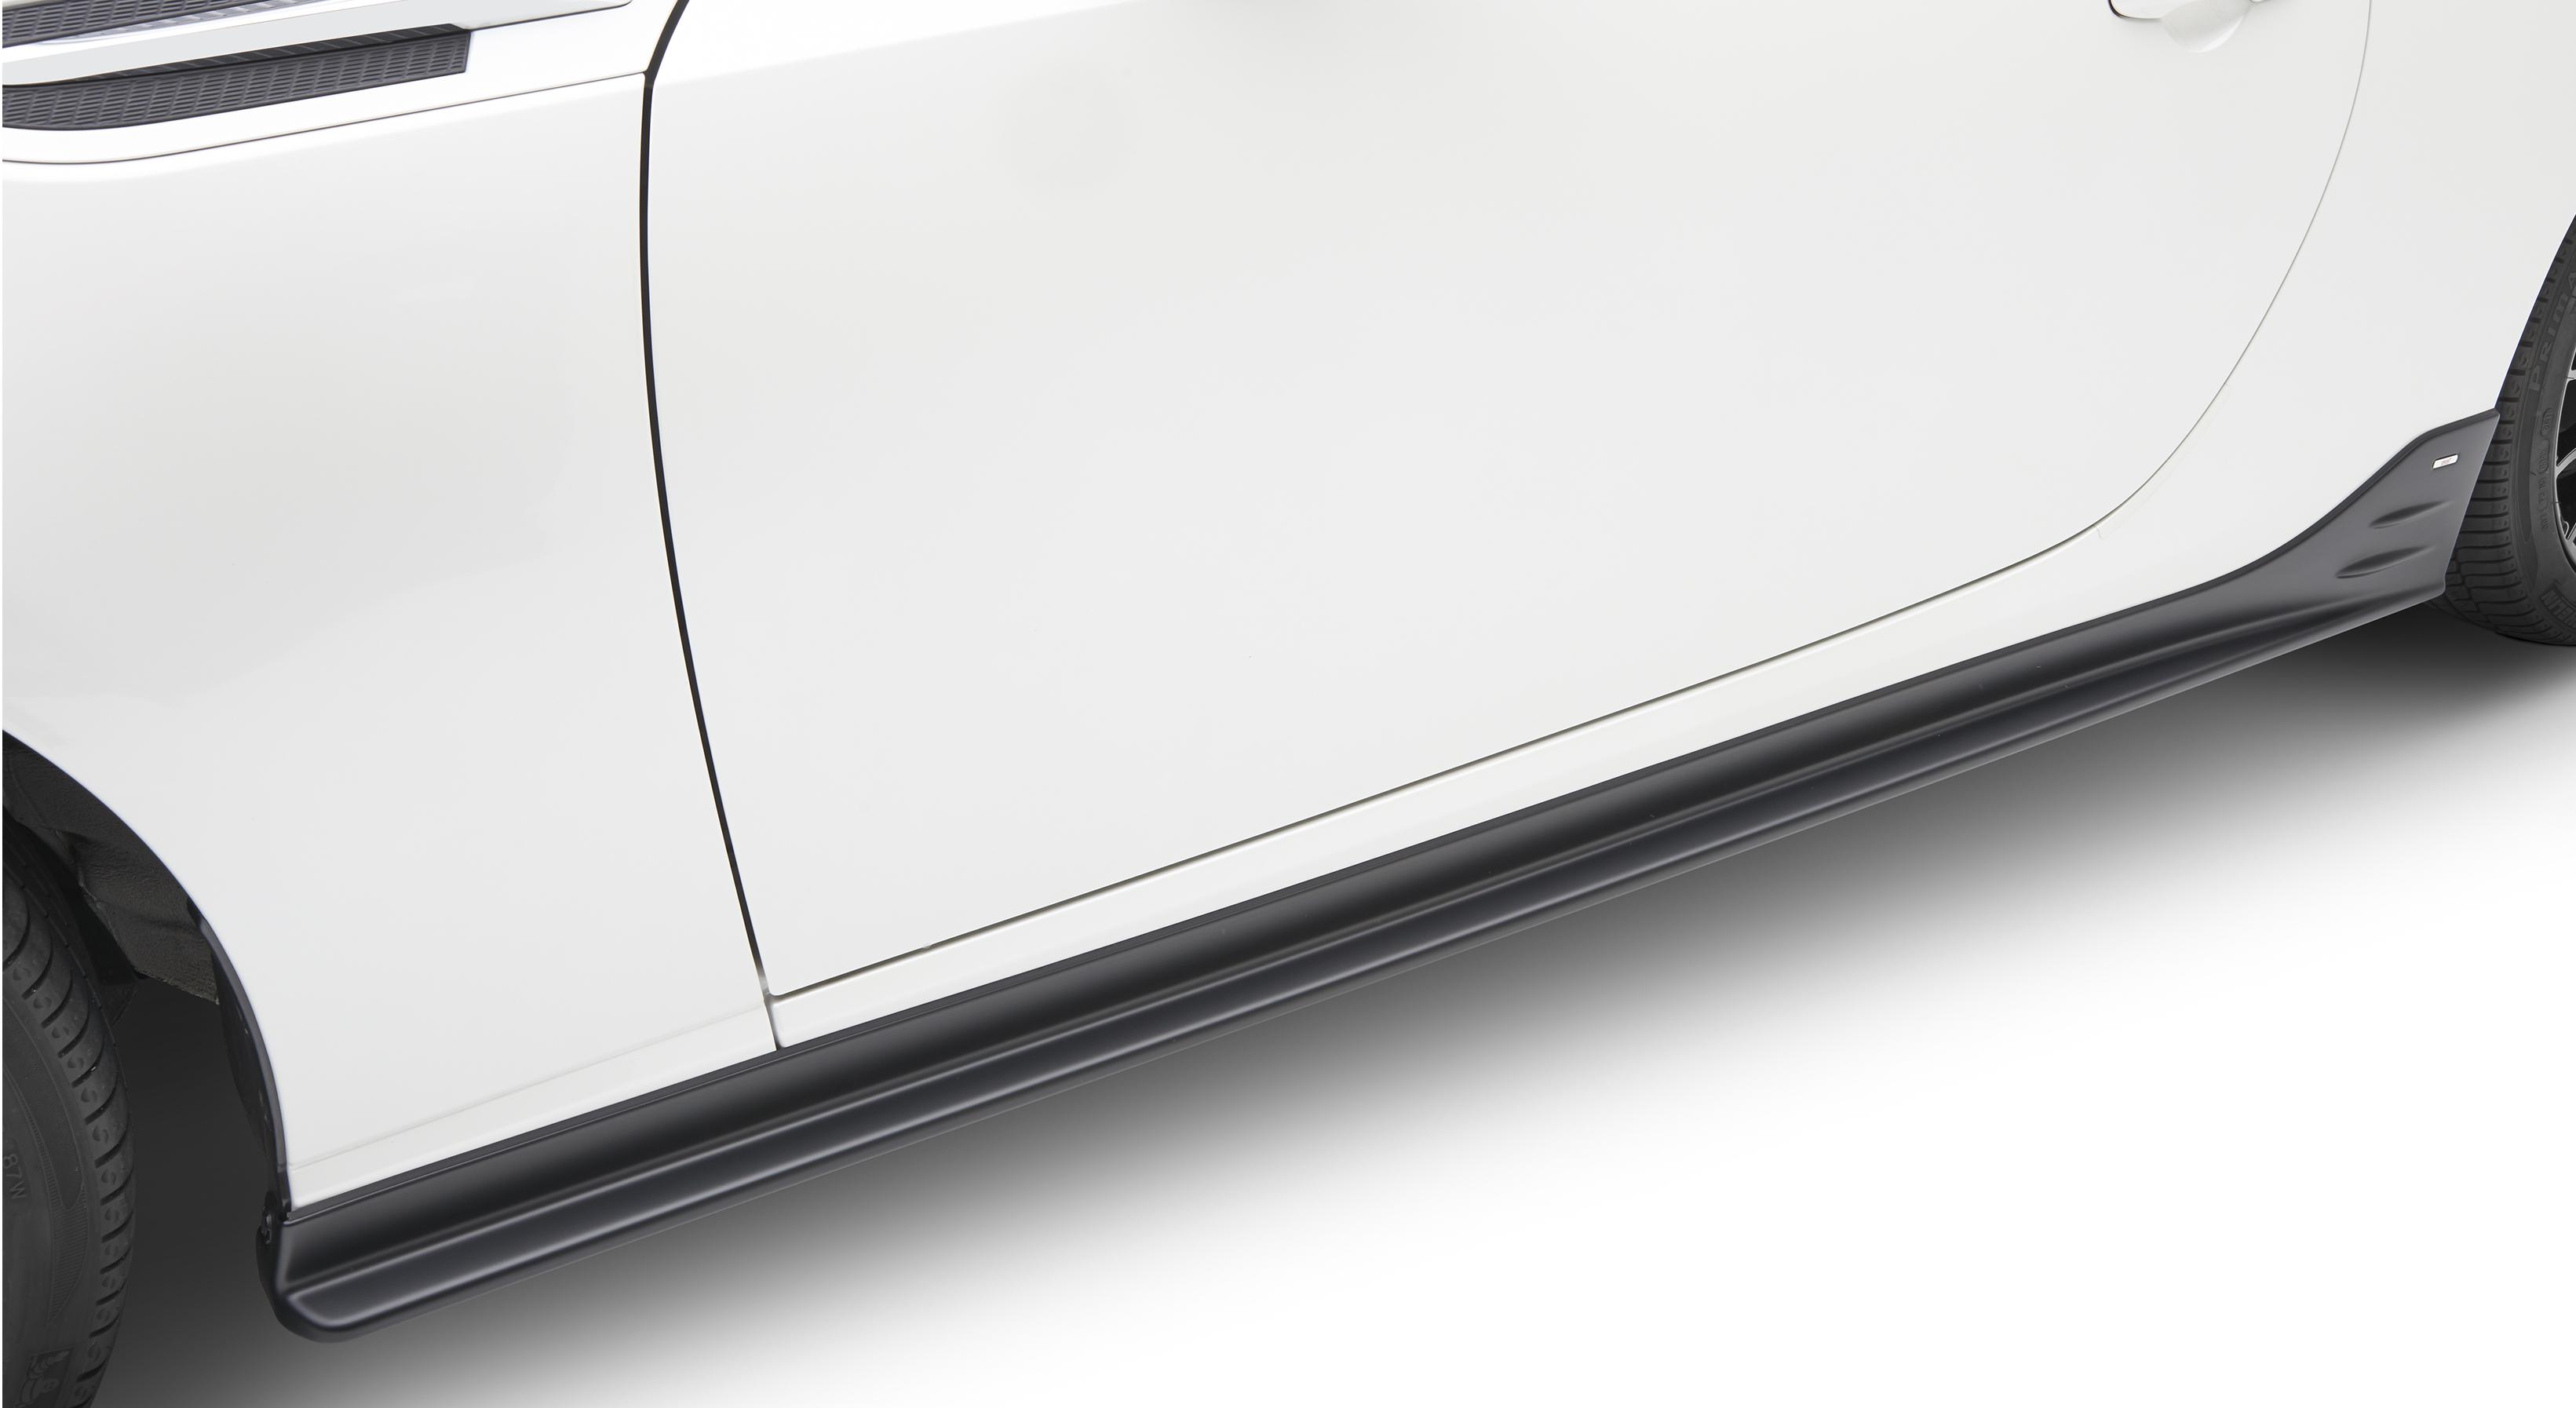 Shop Genuine 2015 Subaru Brz Accessories From Camelback Subaru